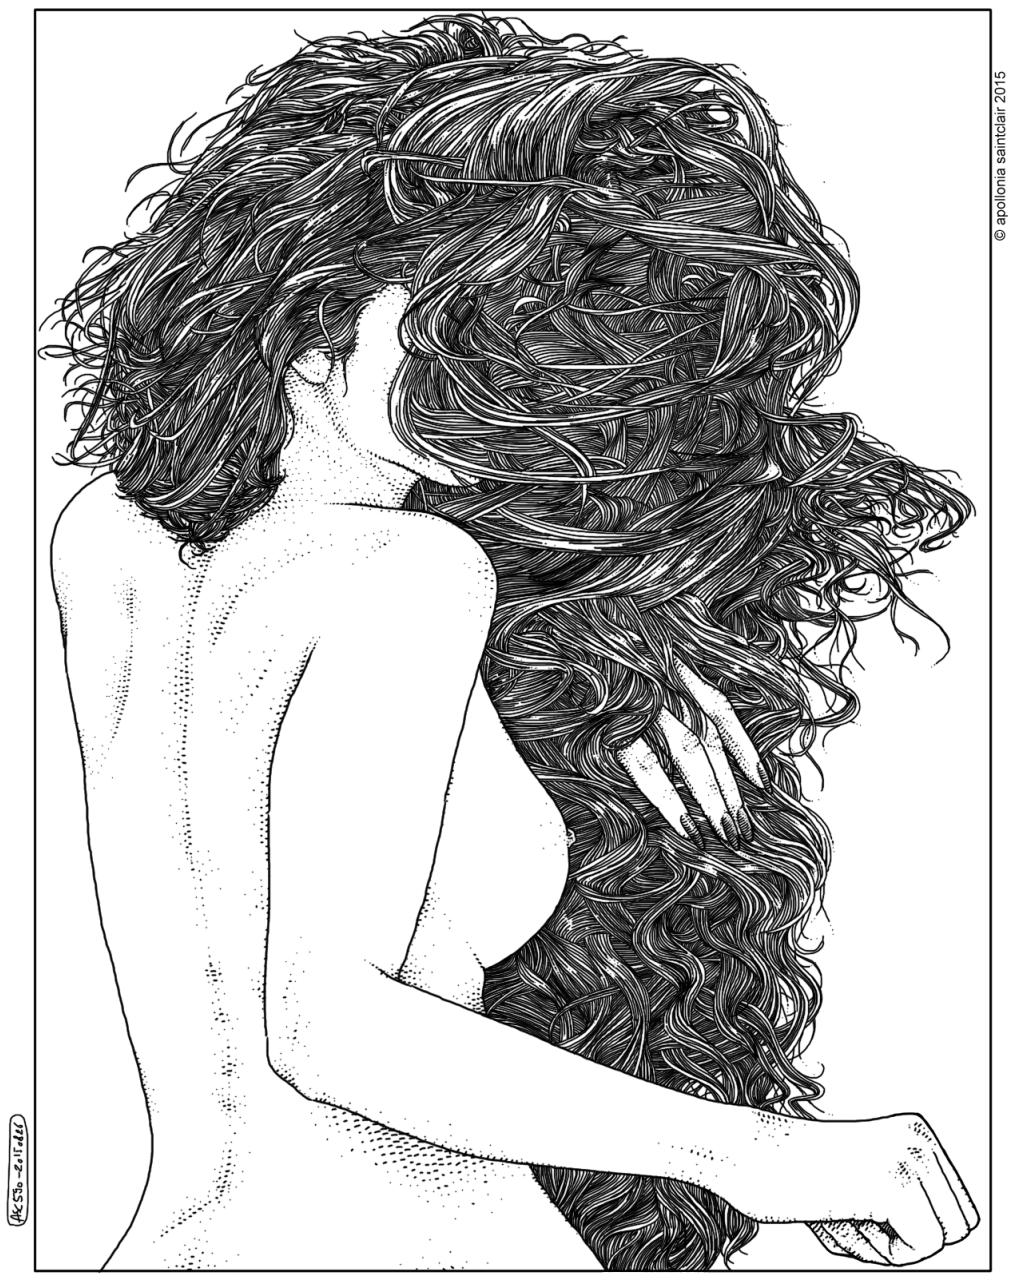 by Apollonia Saintclair